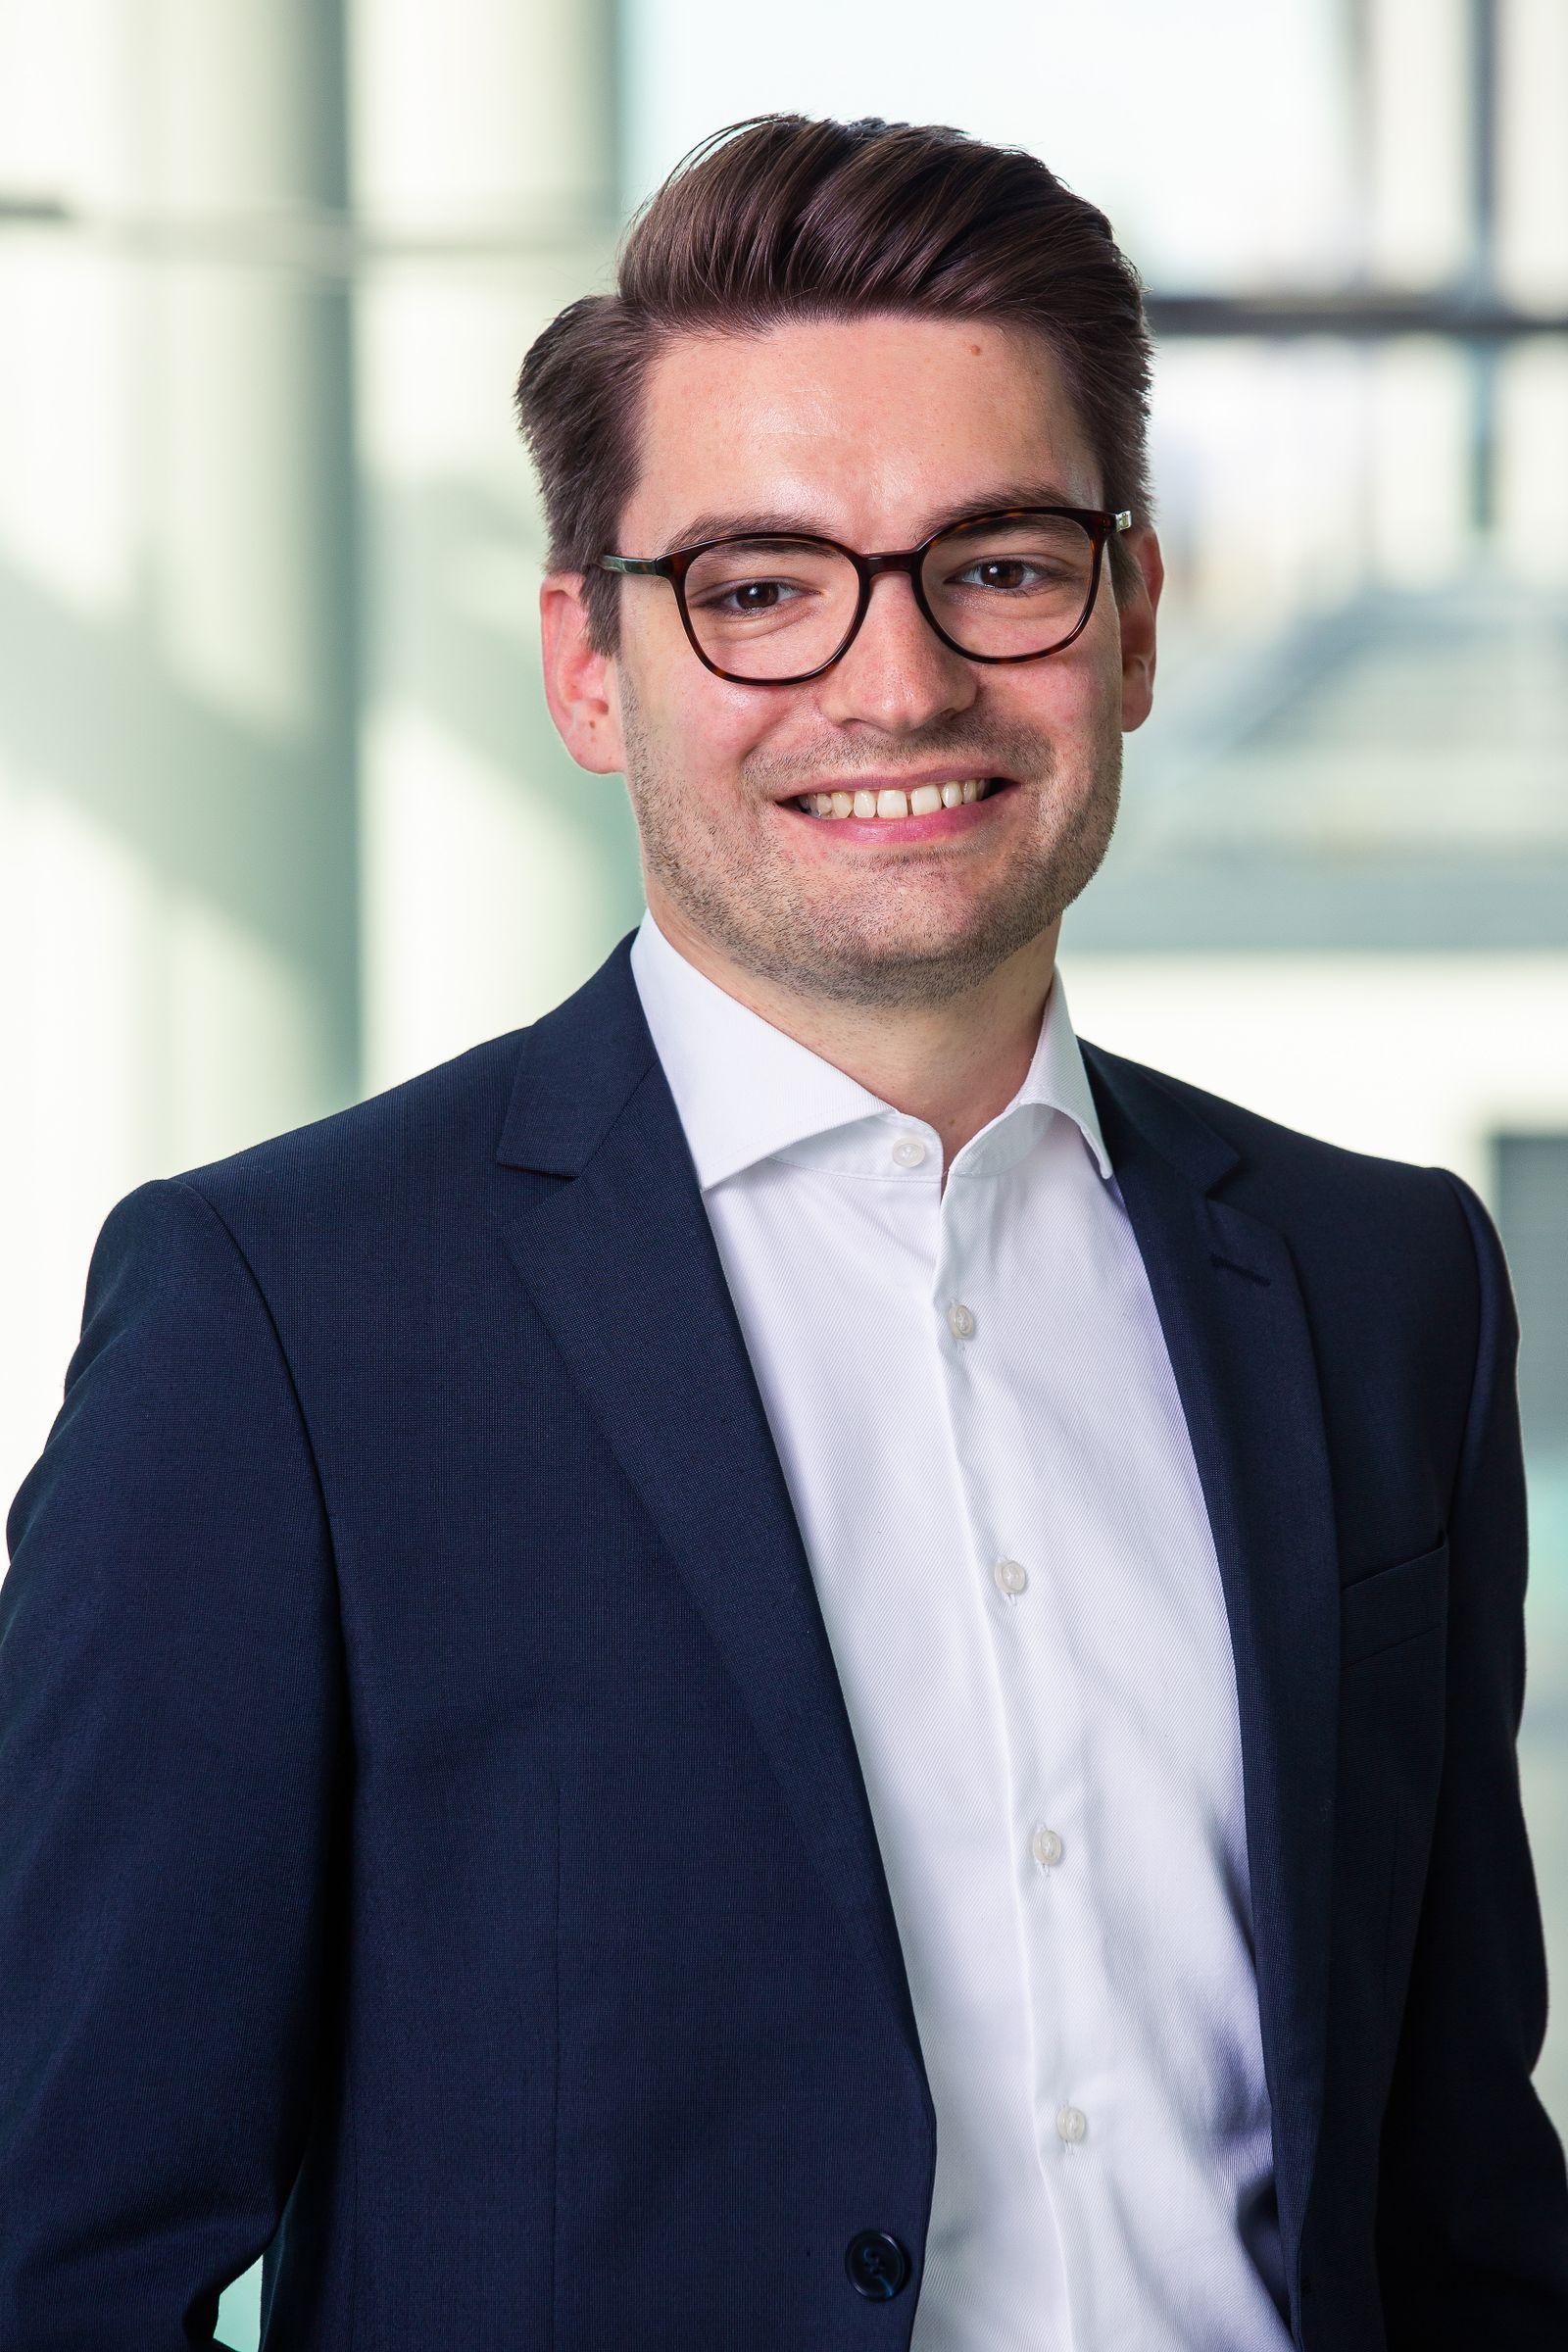 MEJIJ / Jan-Philipp Loch / PR